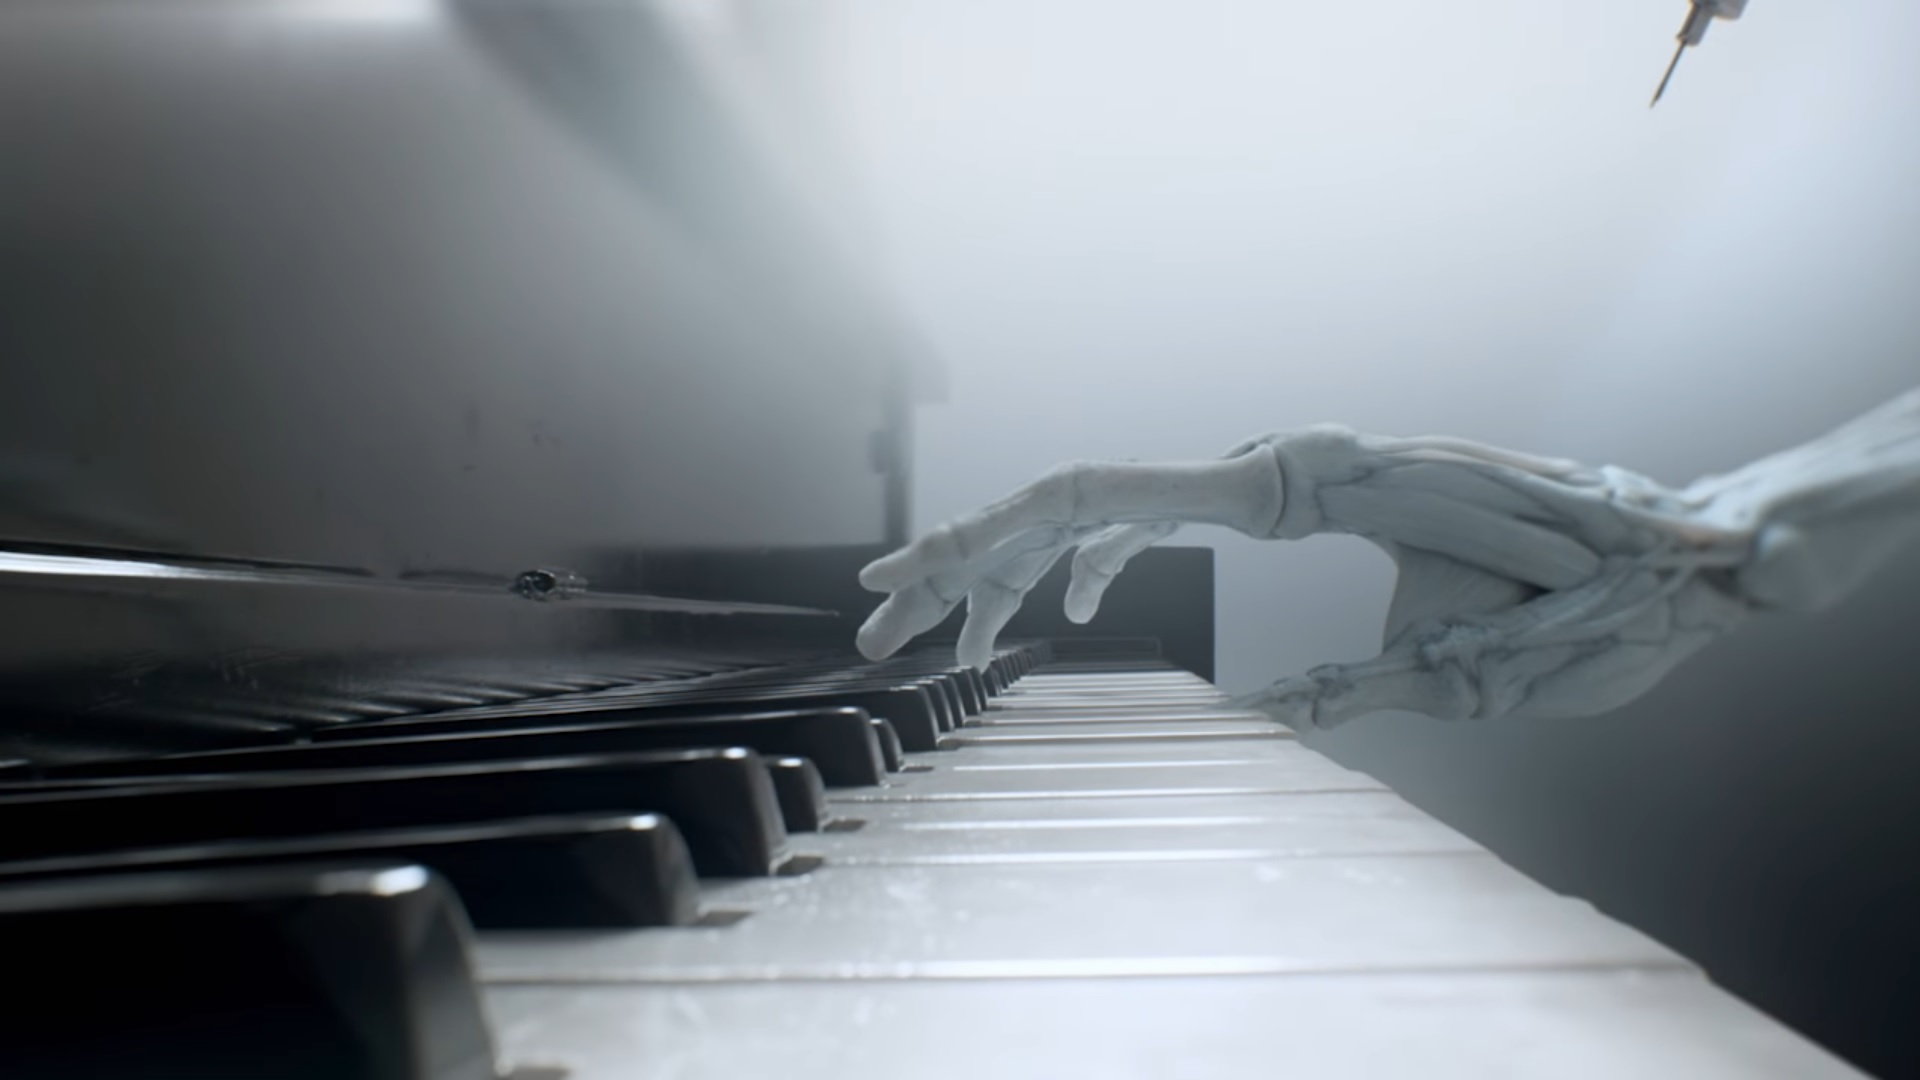 Ramin Djawadi skeletal hands Westworld opening credits